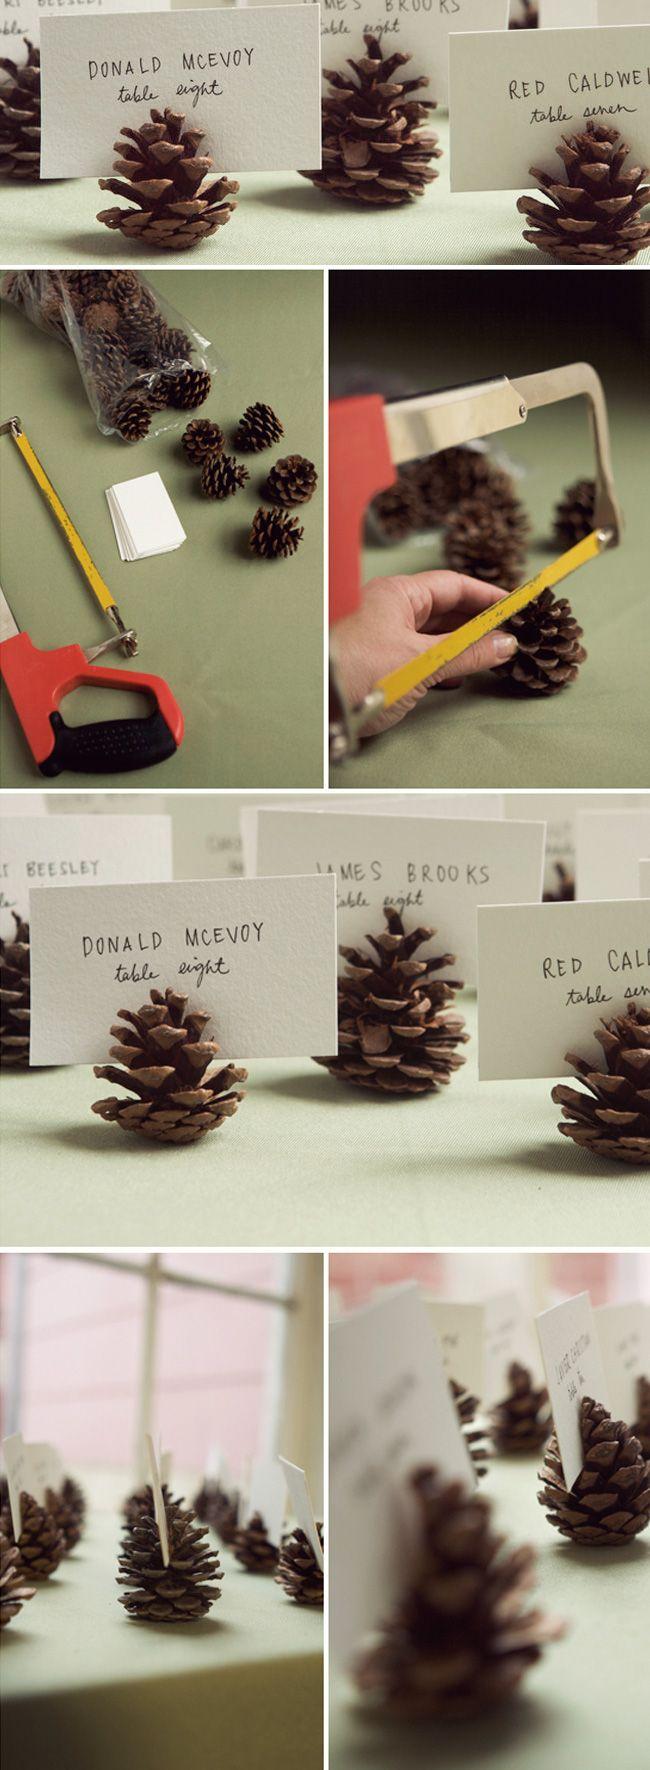 DIY Pinecones Place Card Fall Wedding Idea